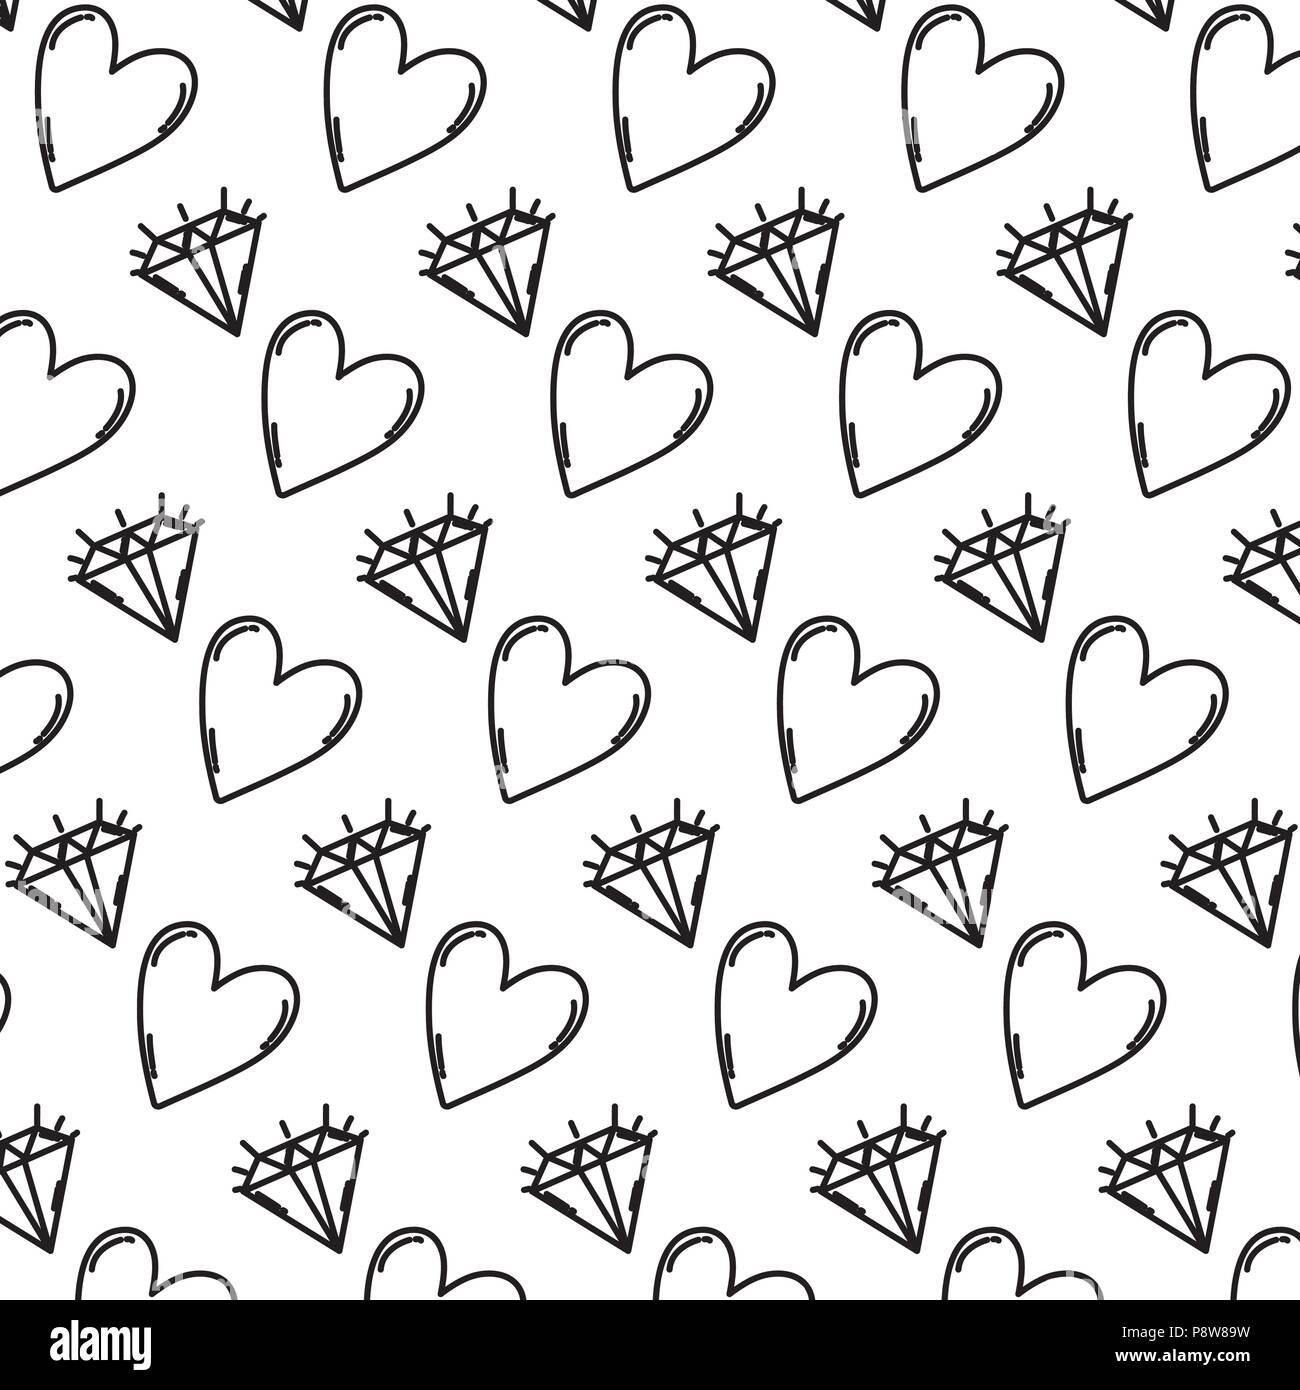 line brillant diamond and heart symbol background vector illustration - Stock Image